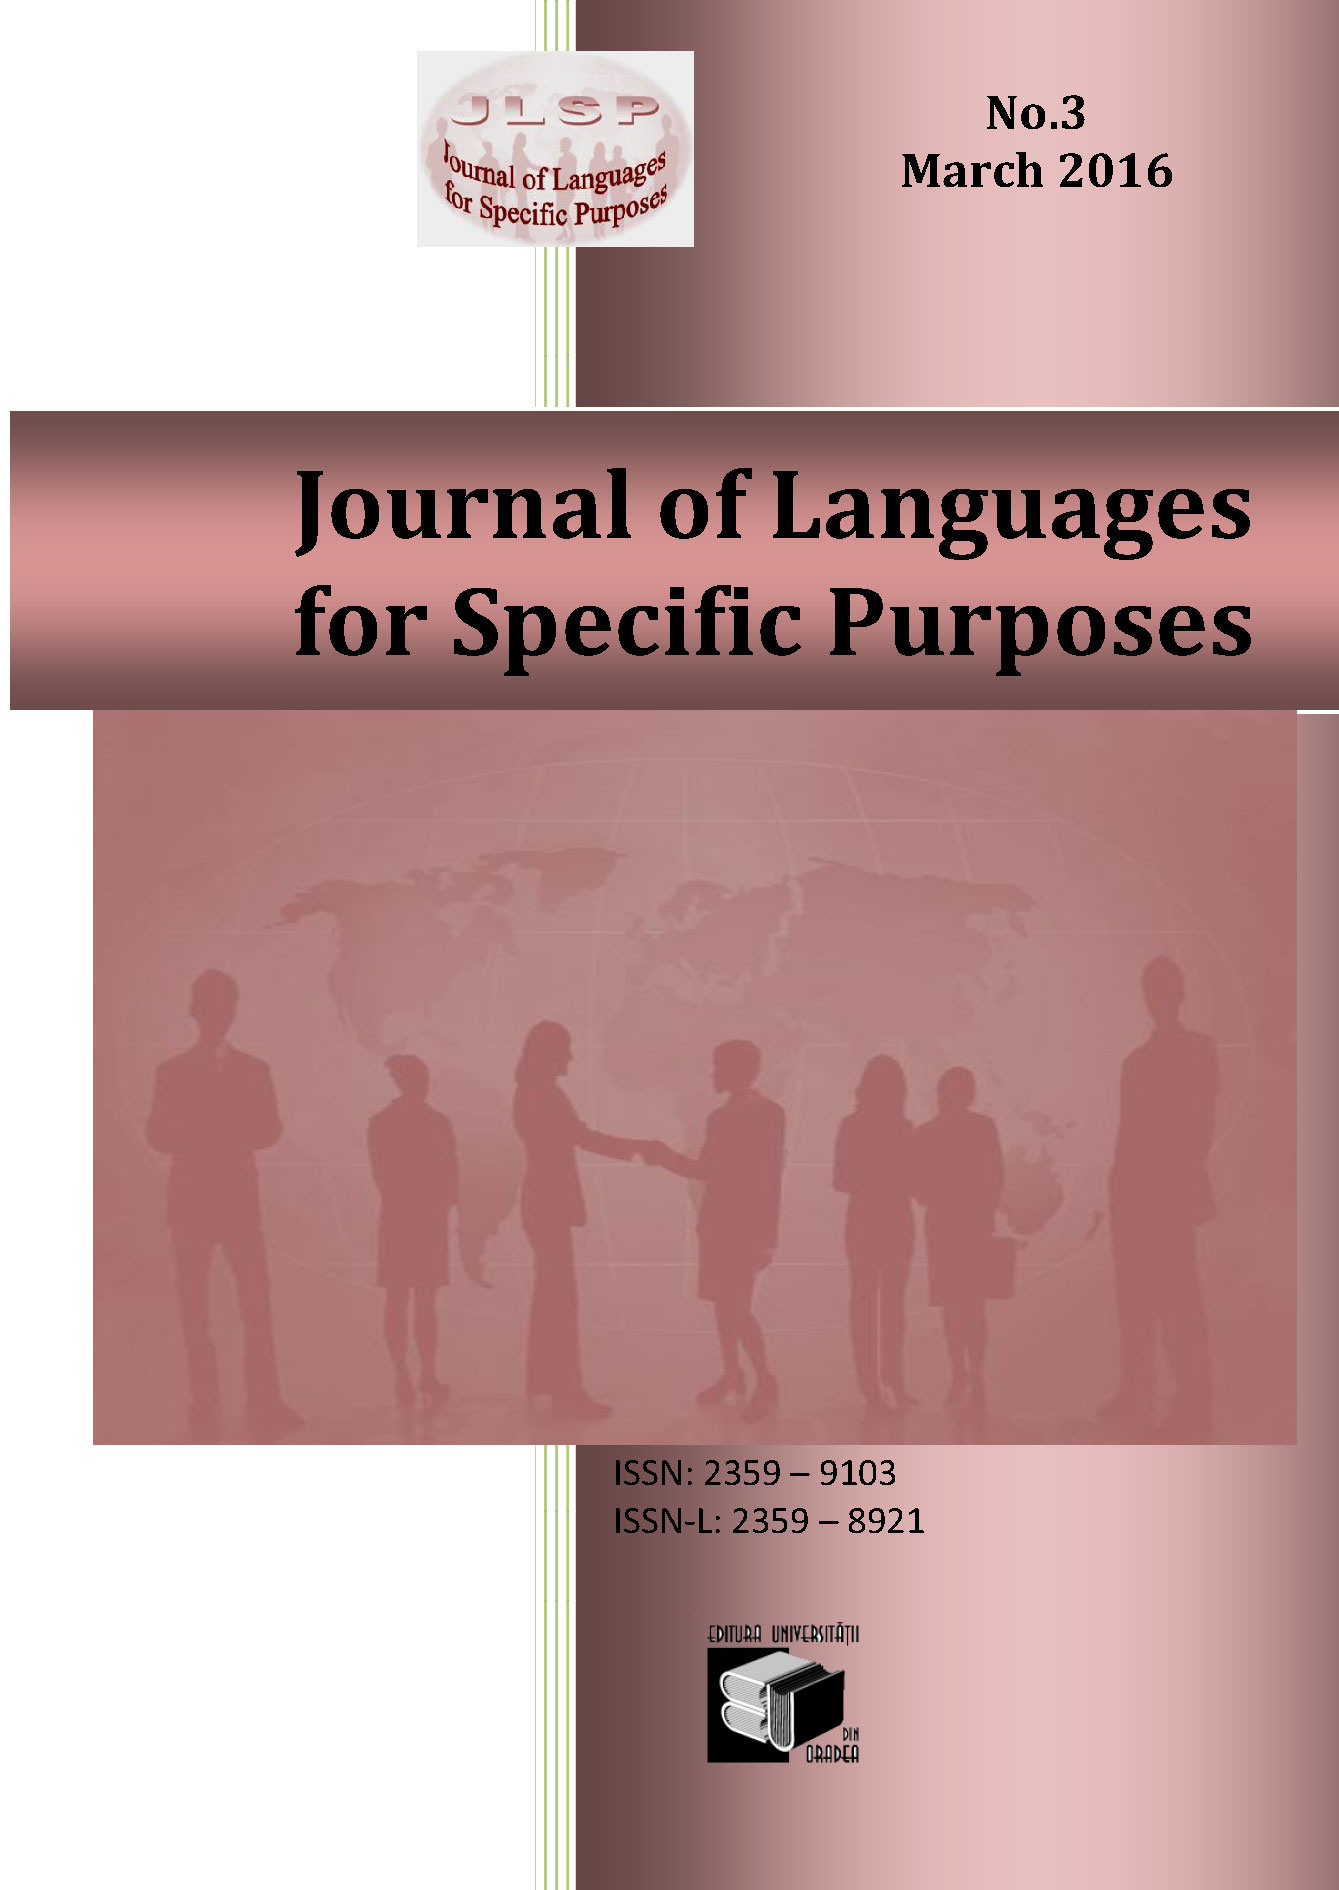 JLSP 3nd Issue is online